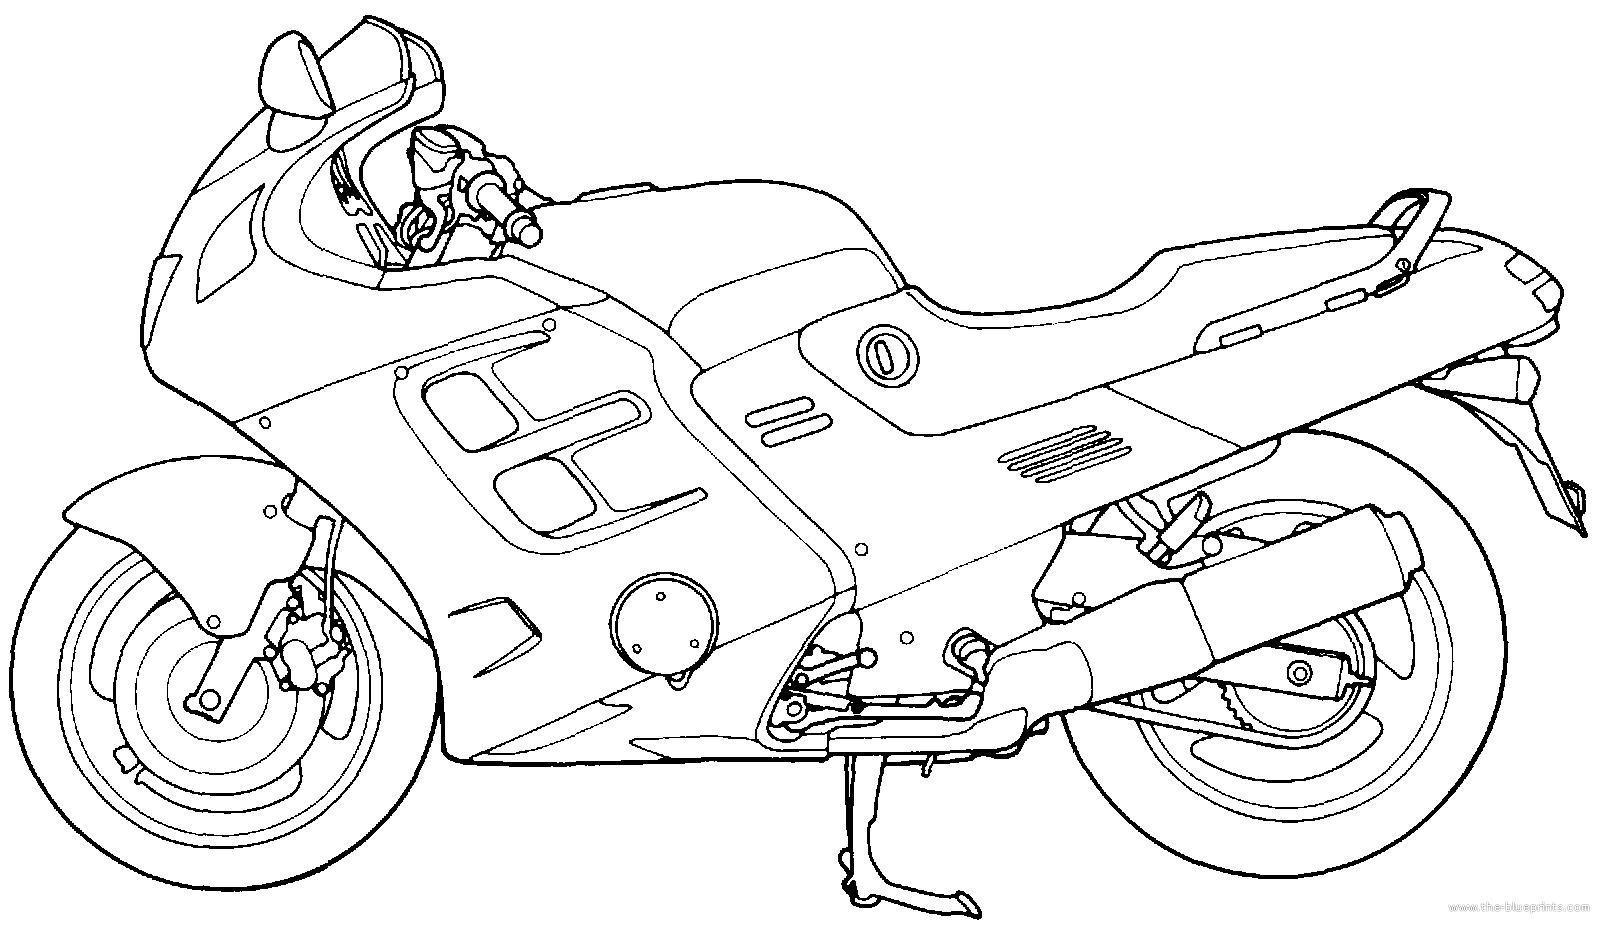 Blueprints > Motorcycles > Honda > Honda CBR 1000F (1989)